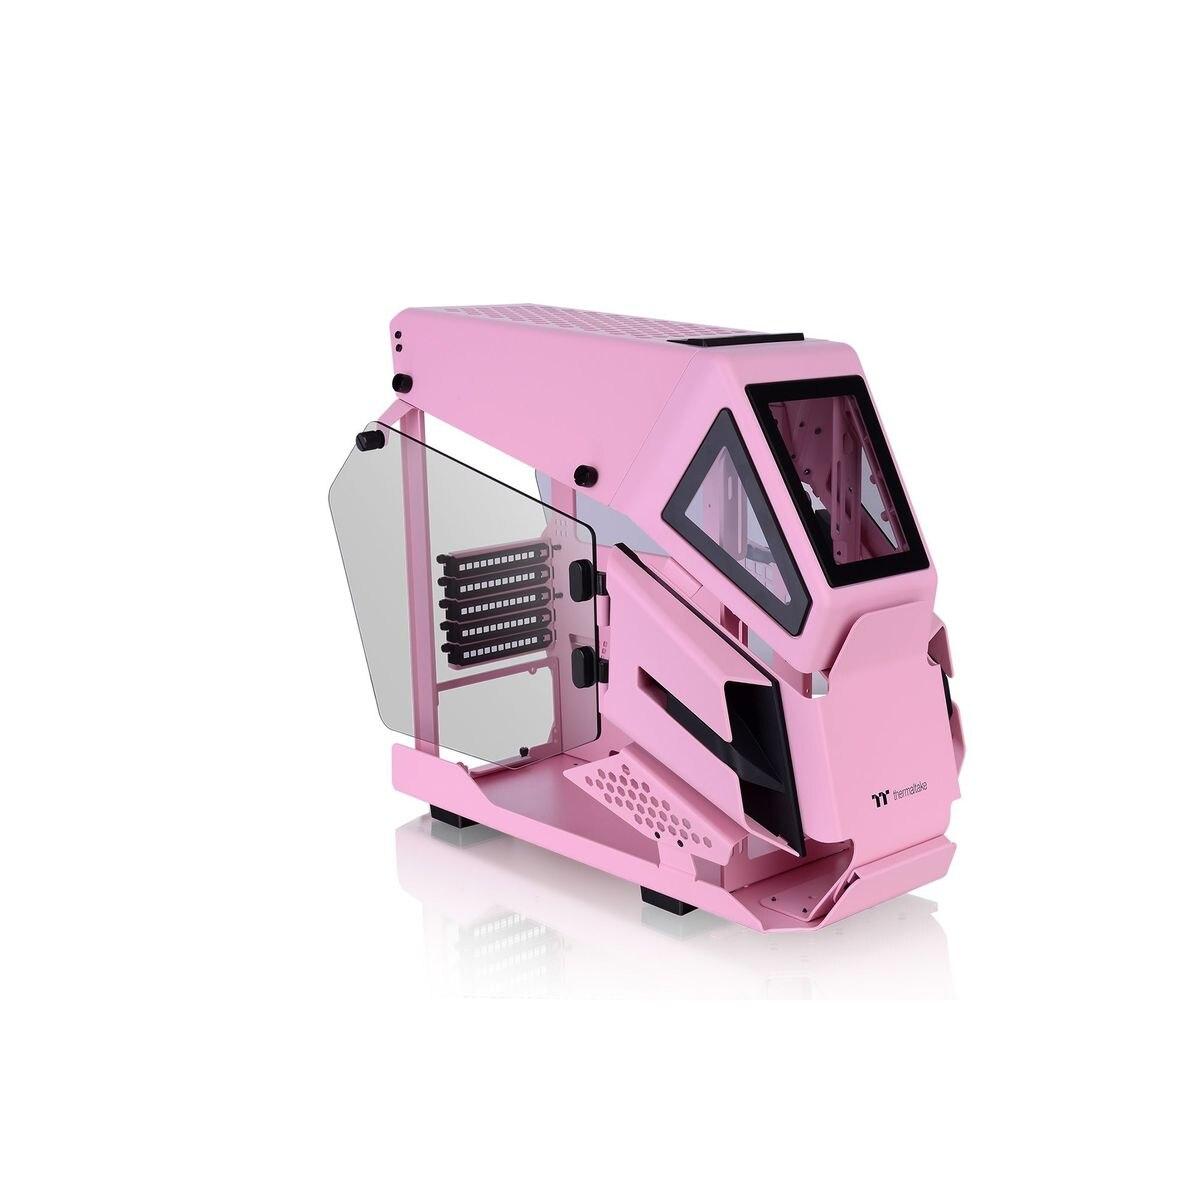 Thermaltake PCケース AH T200 -Pink- CA-1R4-00SAWN-00